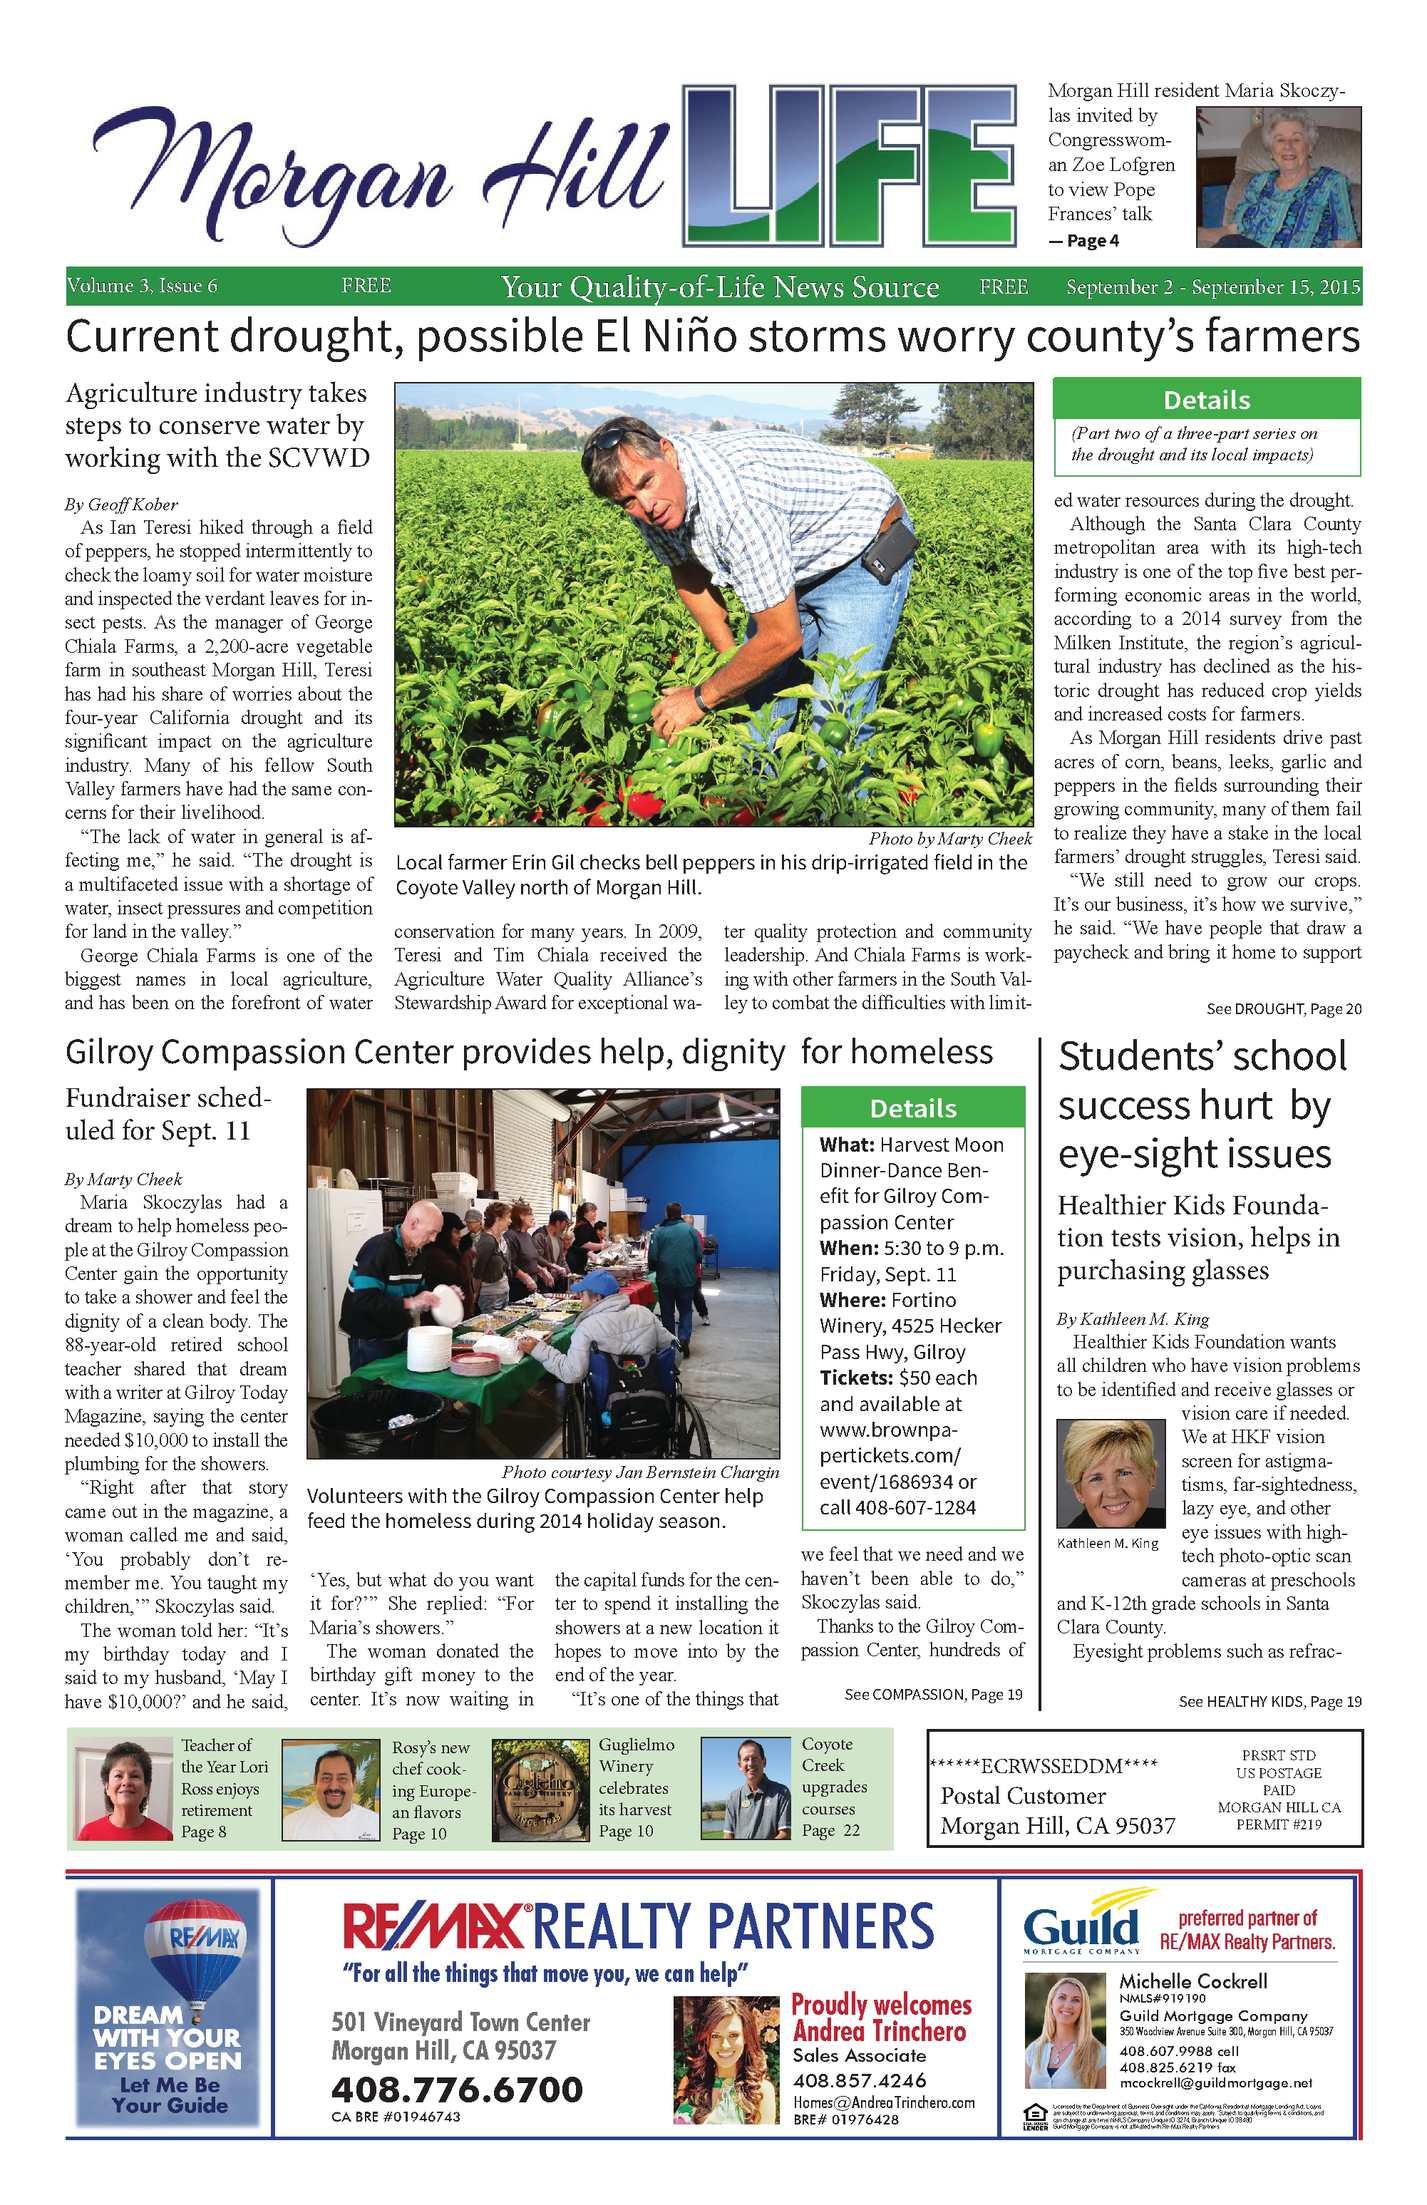 Calaméo - Morgan Hill Life Vol3, issue6, September 2, 2015